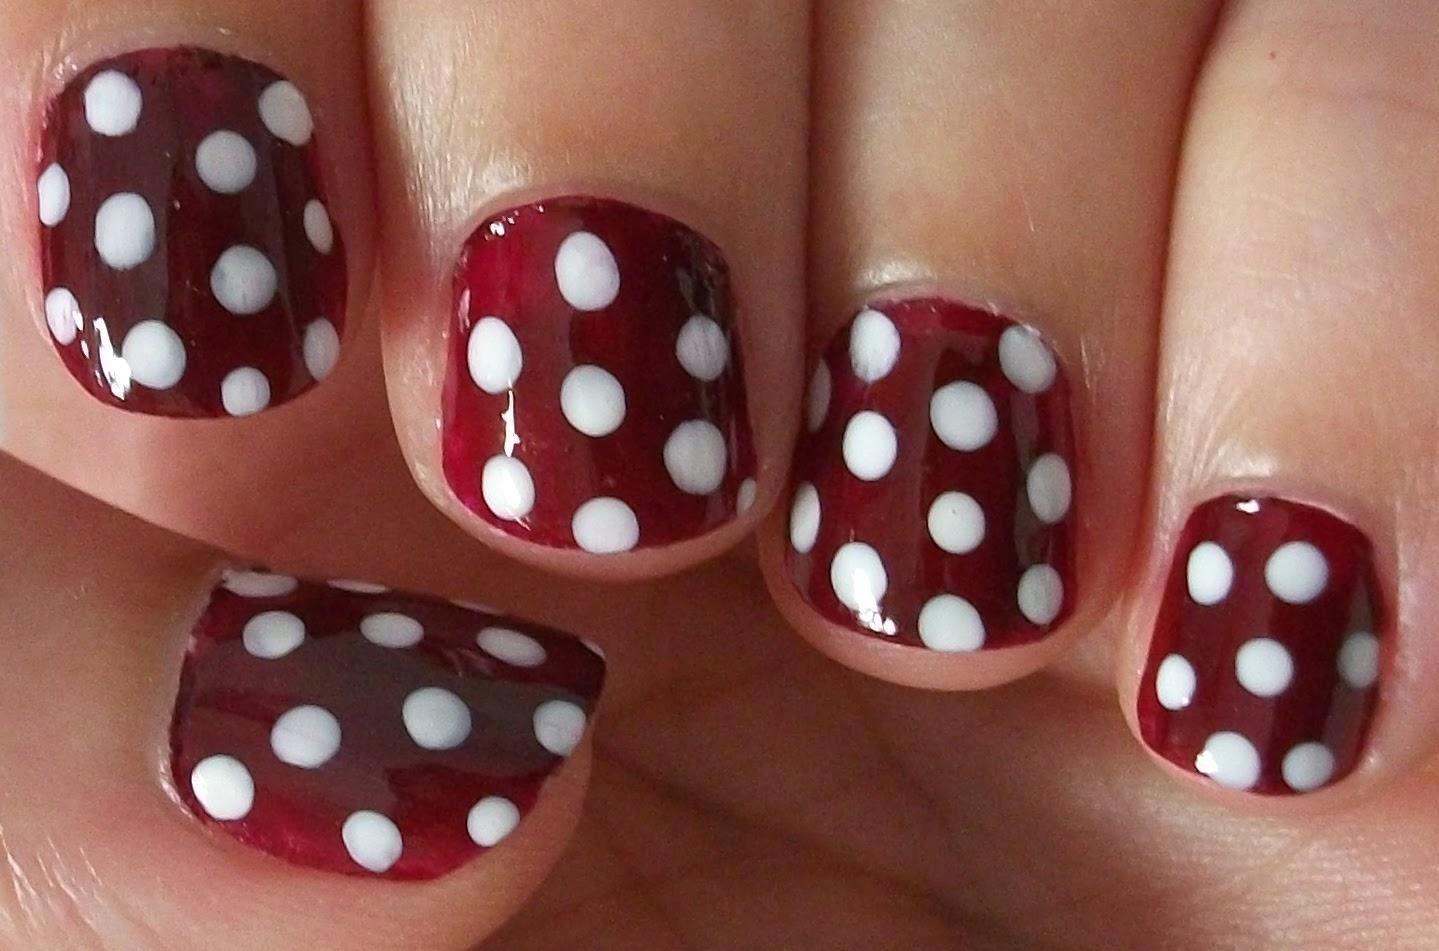 Imagenes lindas de uñas decoradas bien, lindos diseños modernos de uñas